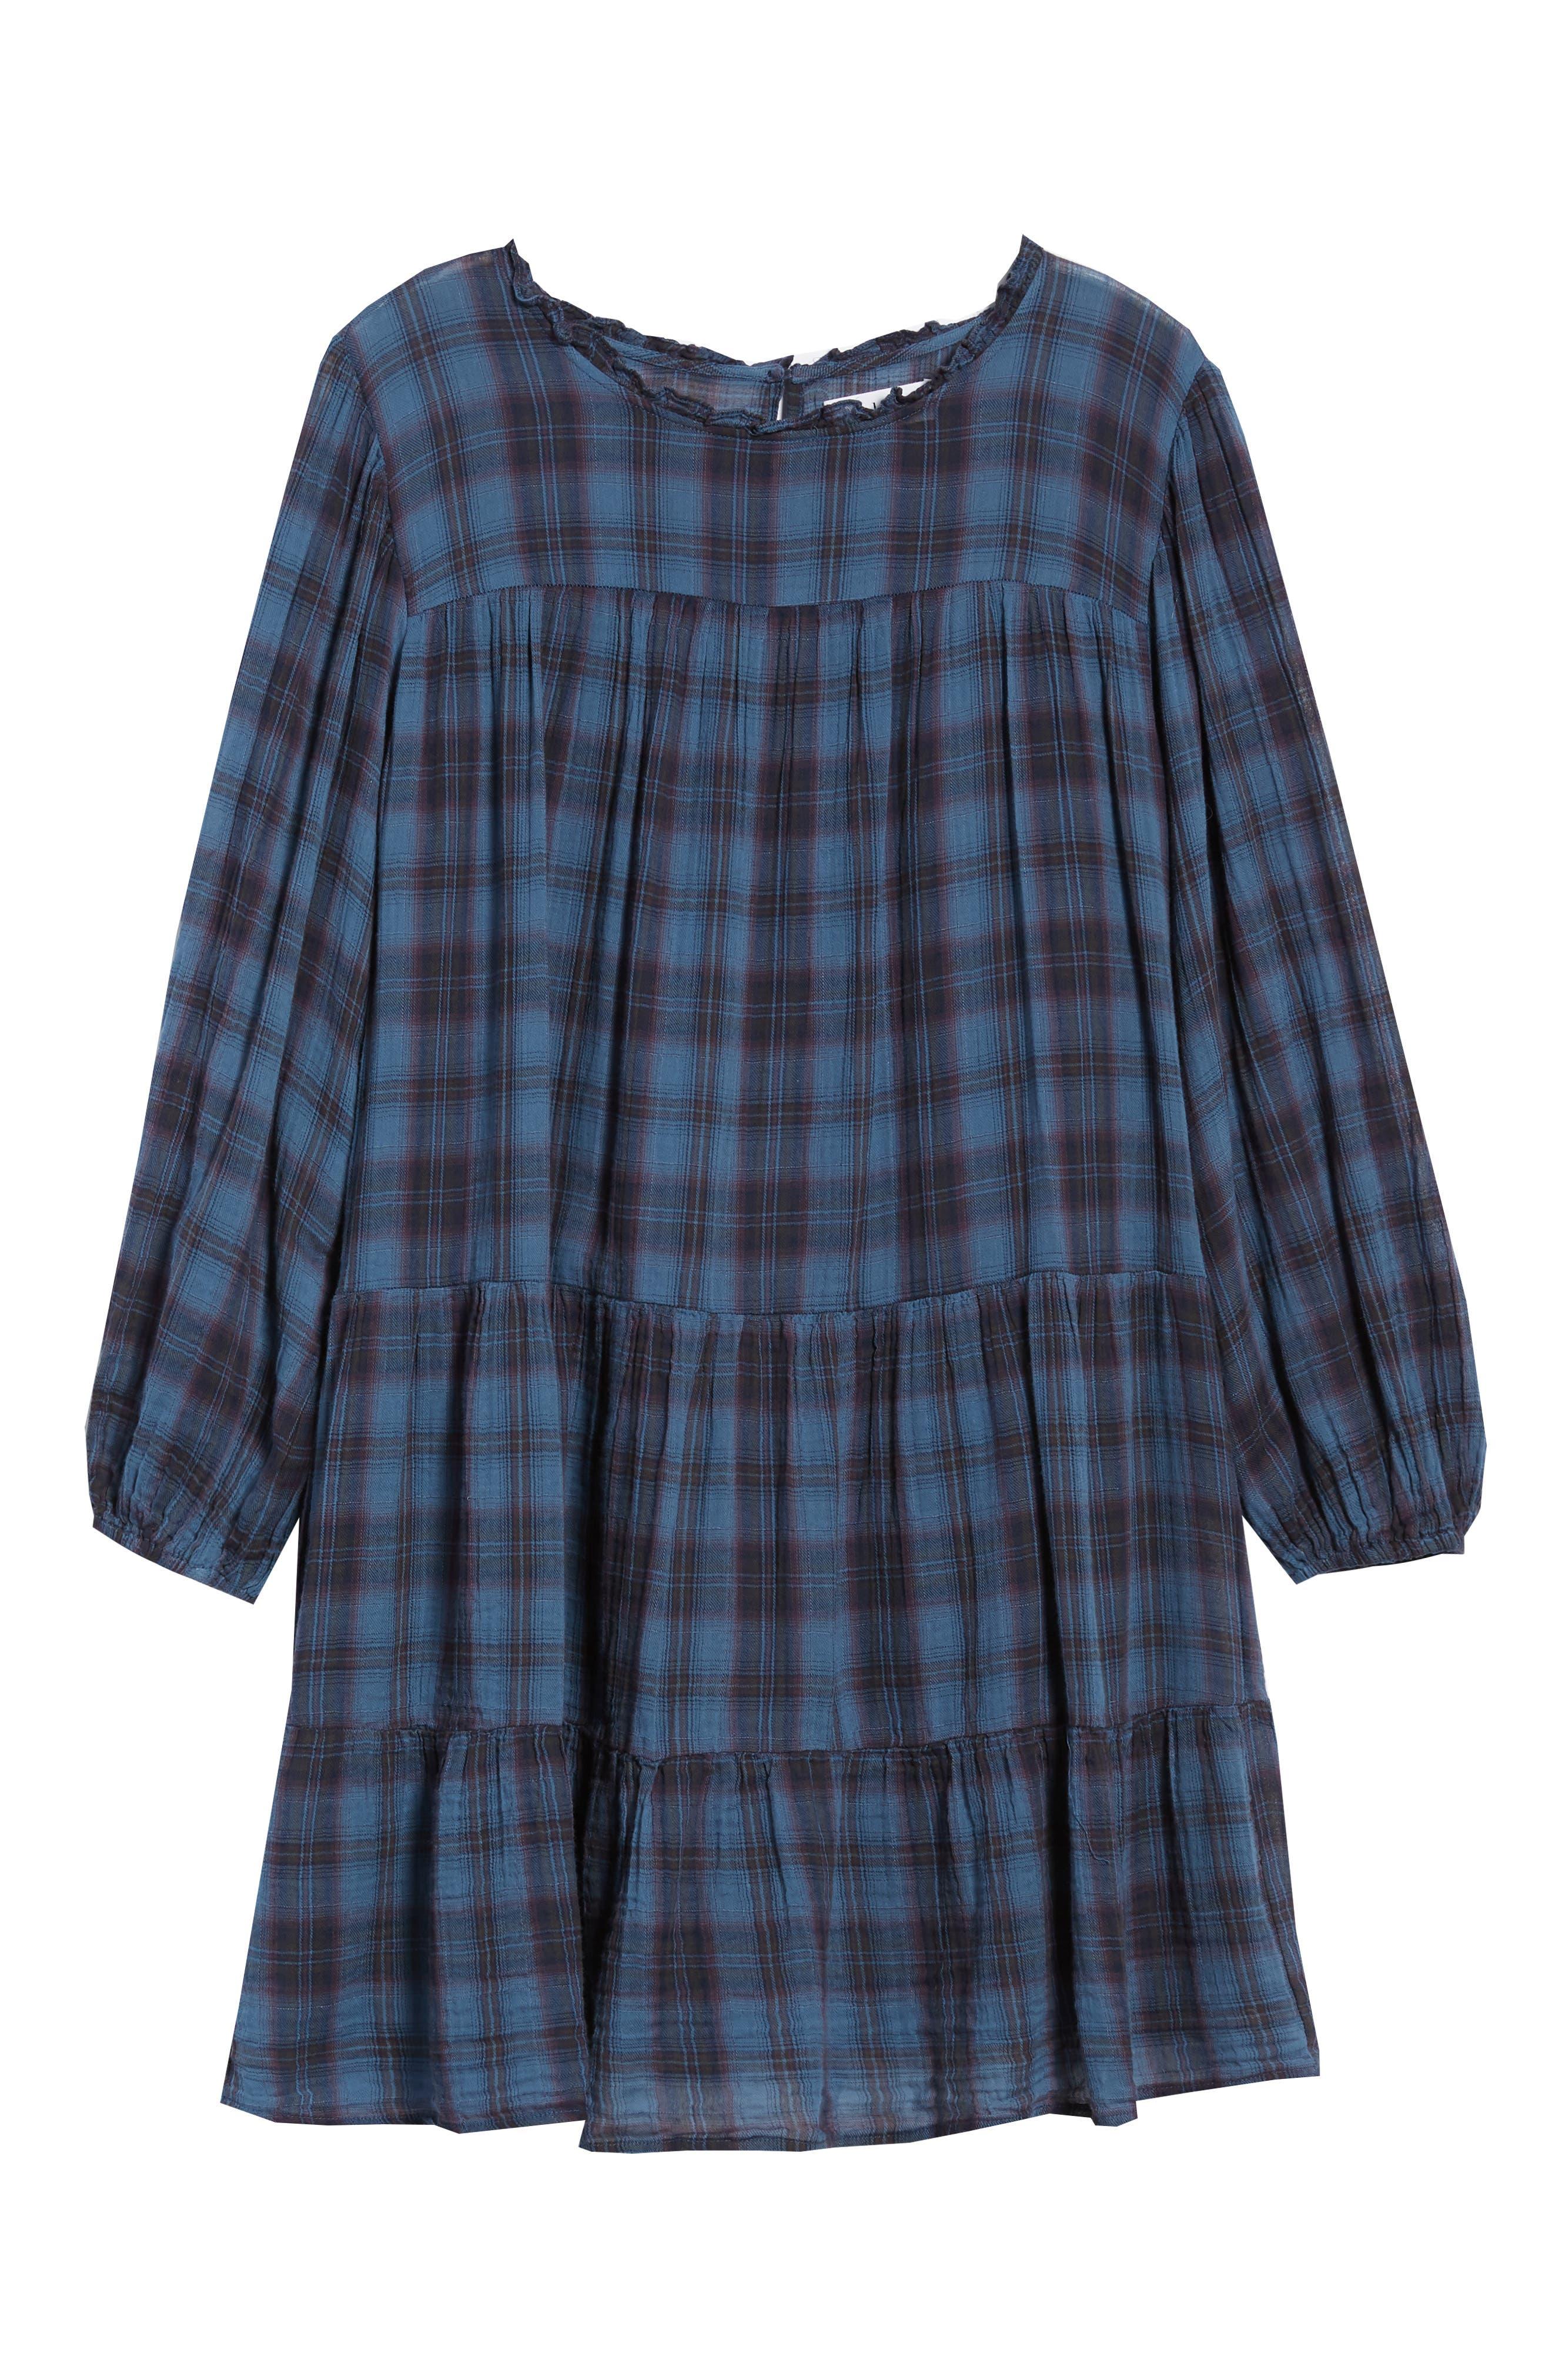 Soft Tiered Plaid Cotton Shift Dress,                             Alternate thumbnail 7, color,                             437